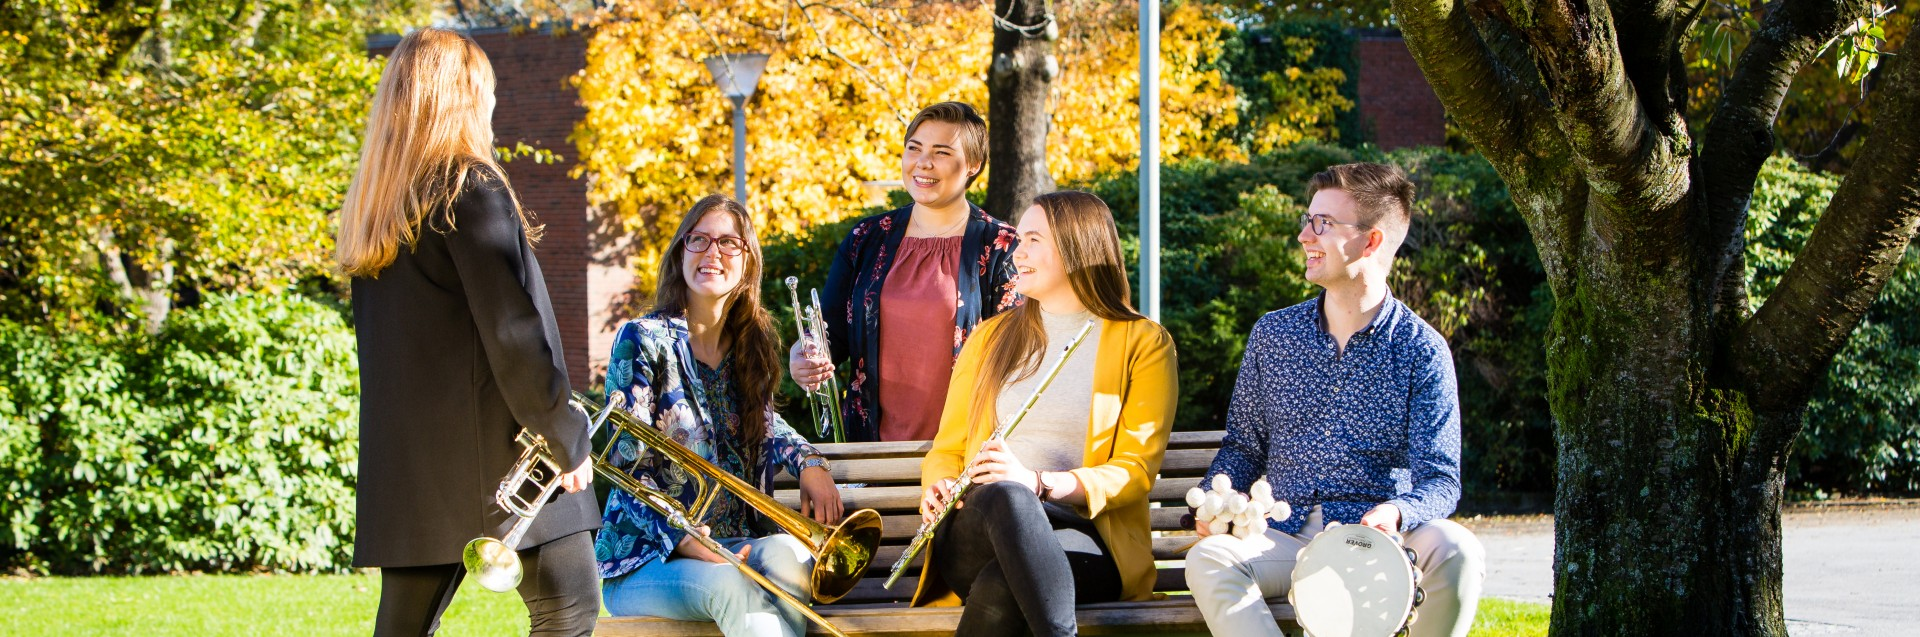 Studenter på campus Bjergsted. Foto: Marius Vervik, 2018